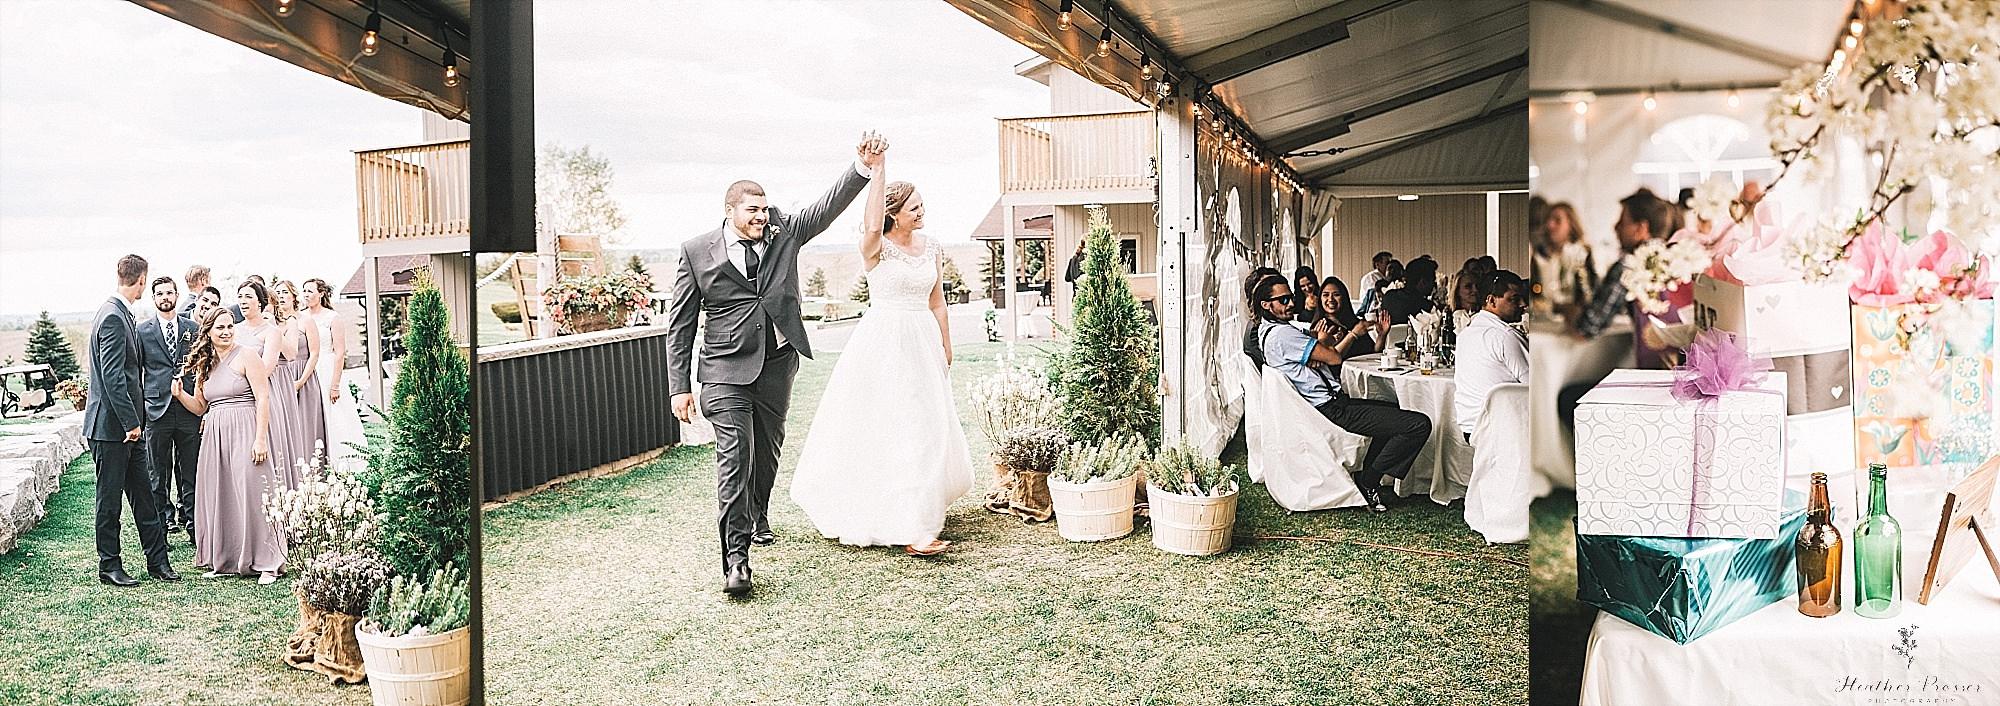 Destination Wedding_0211.jpg